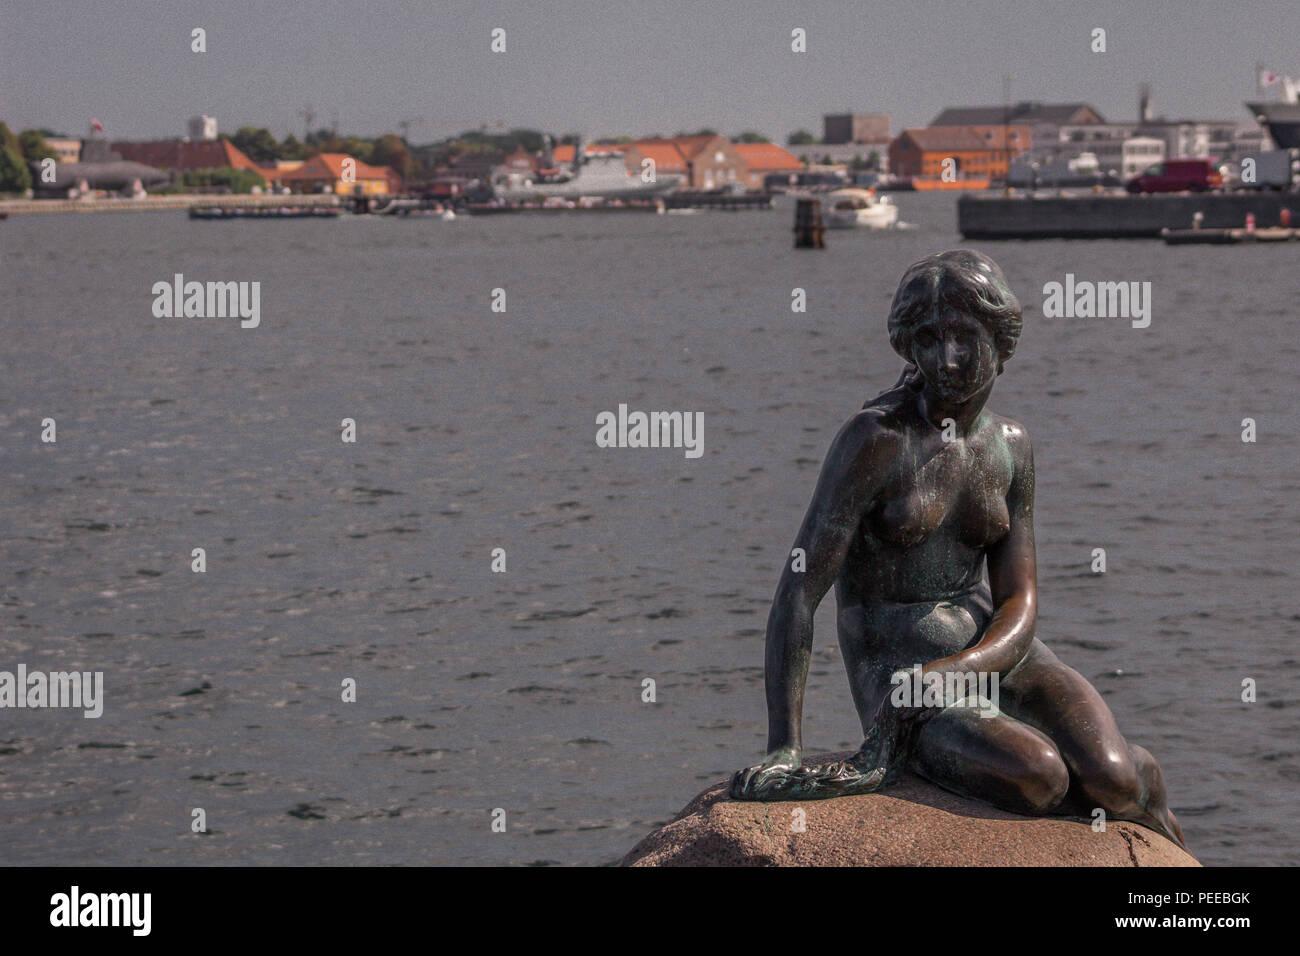 The Little Mermaid, Langelinie, København Ø, Denmark - Stock Image